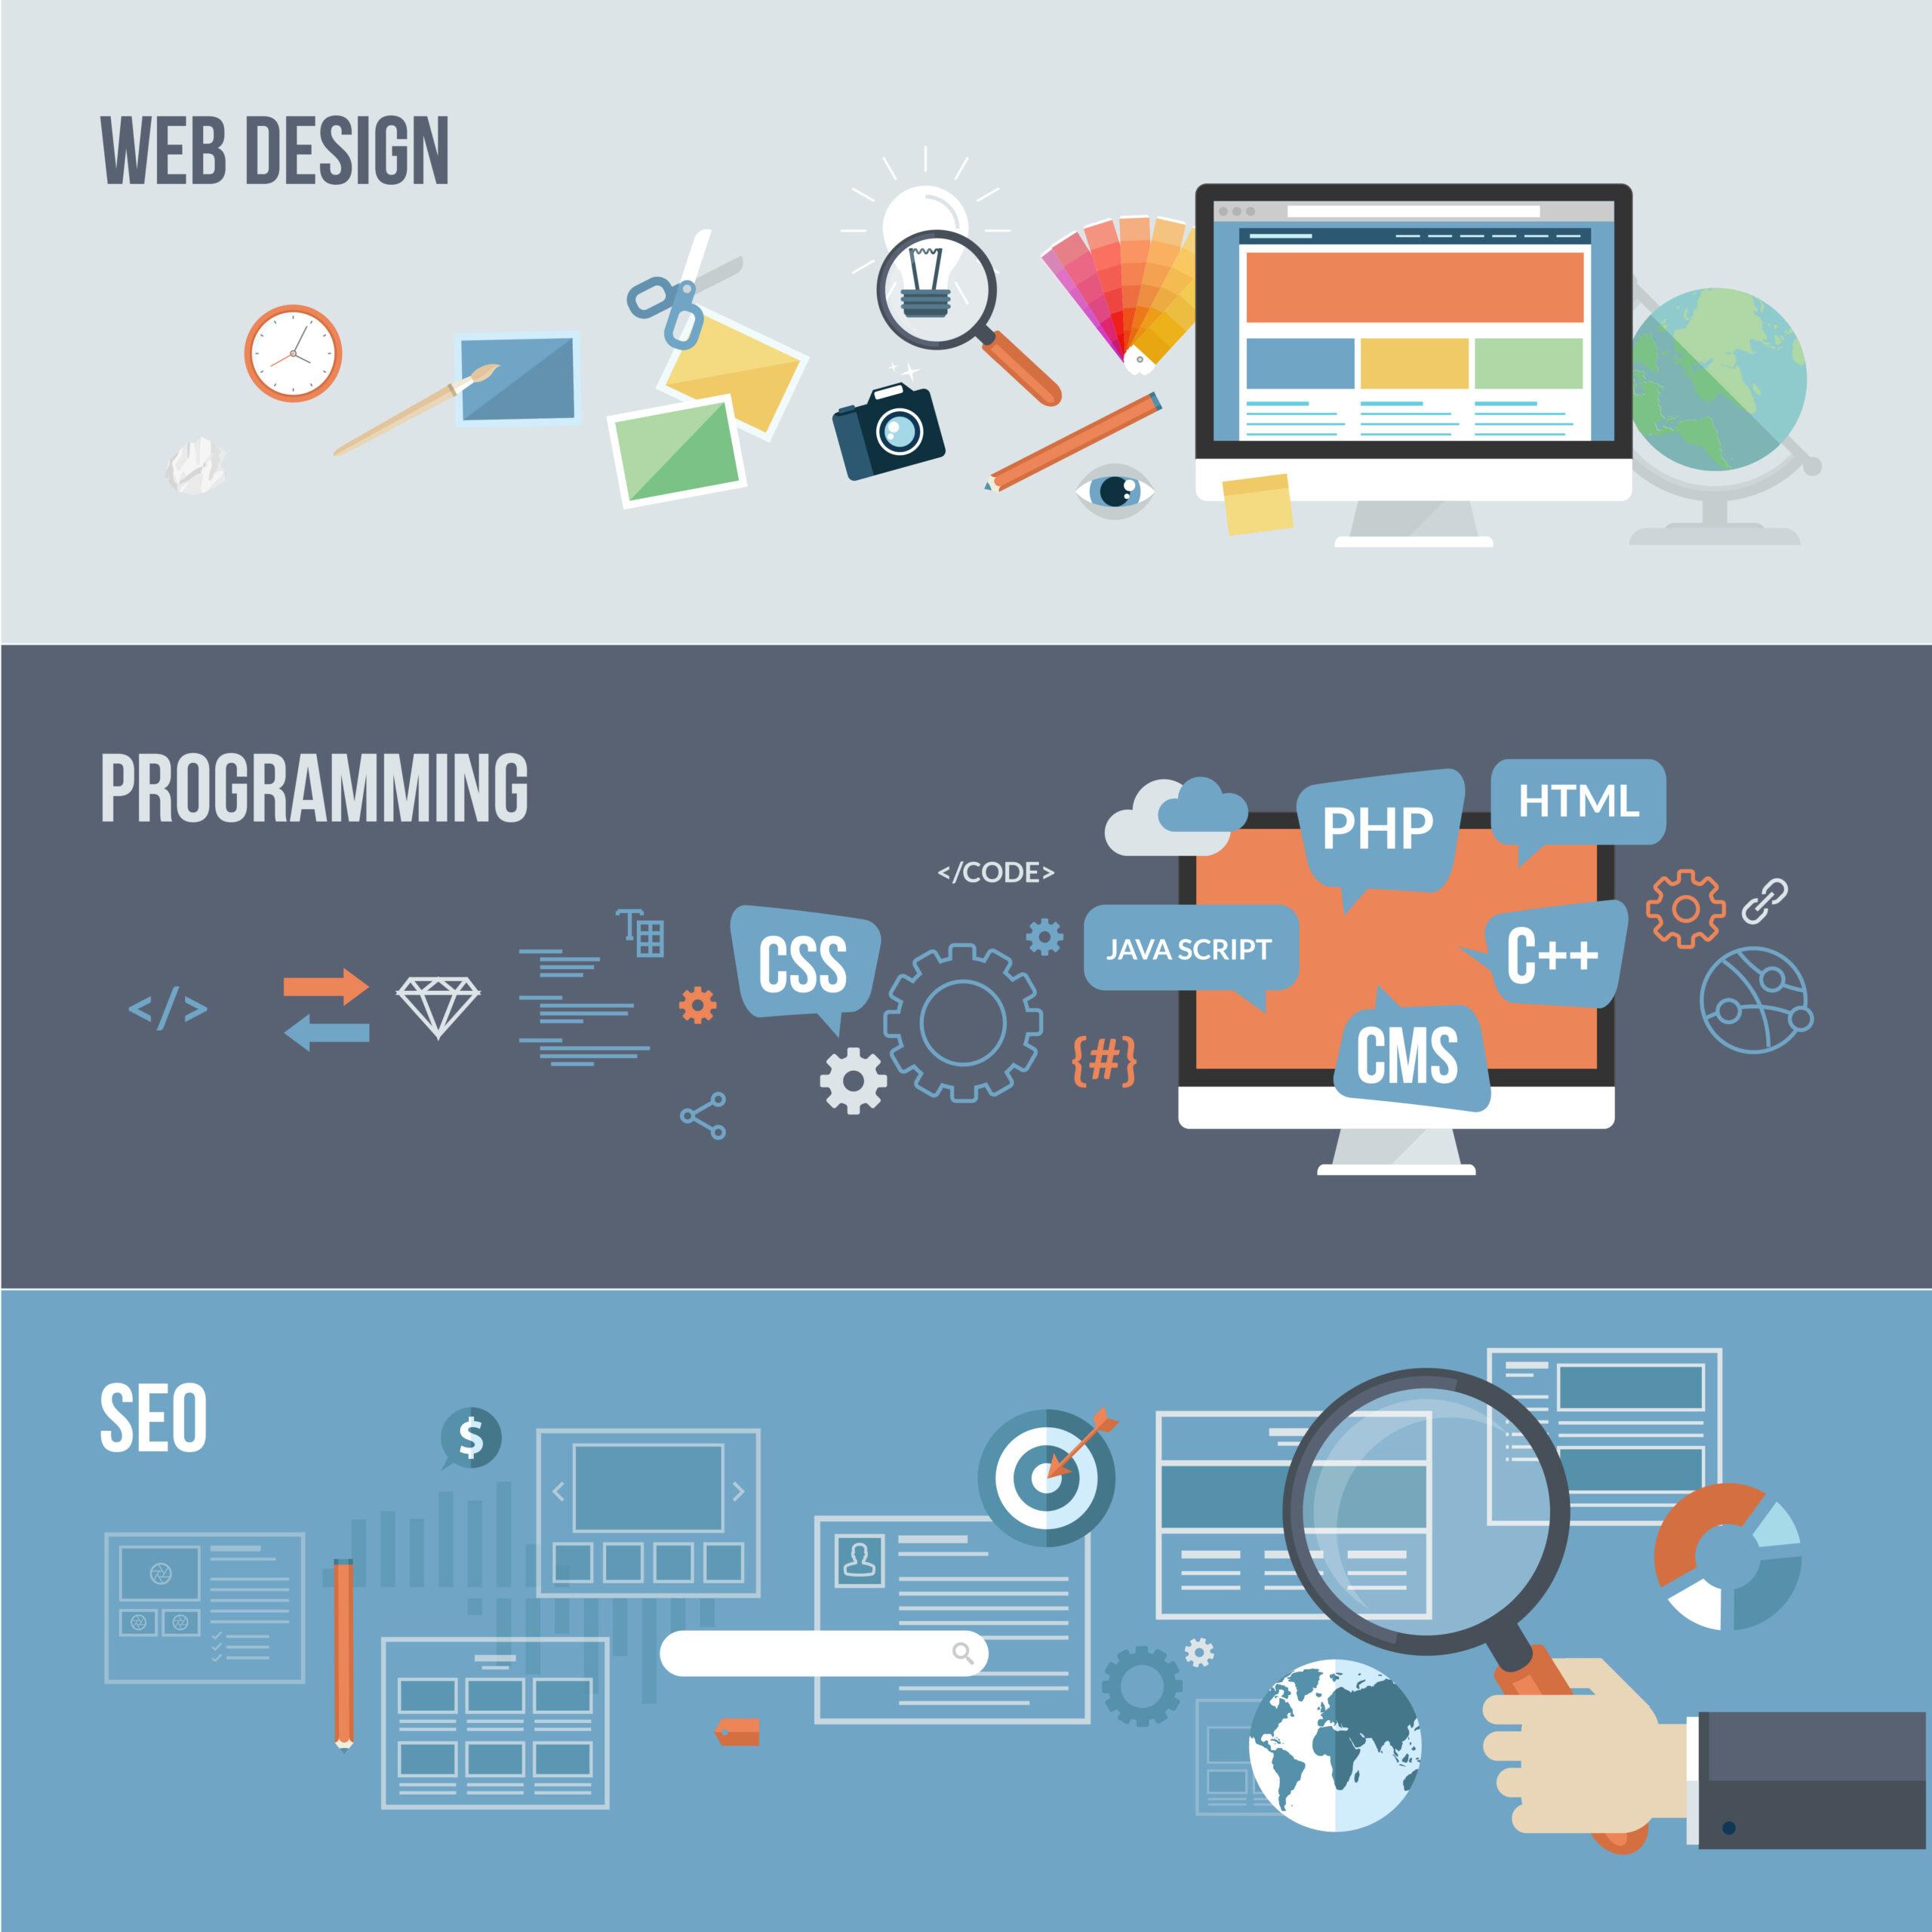 Web-Design-scaled.jpg